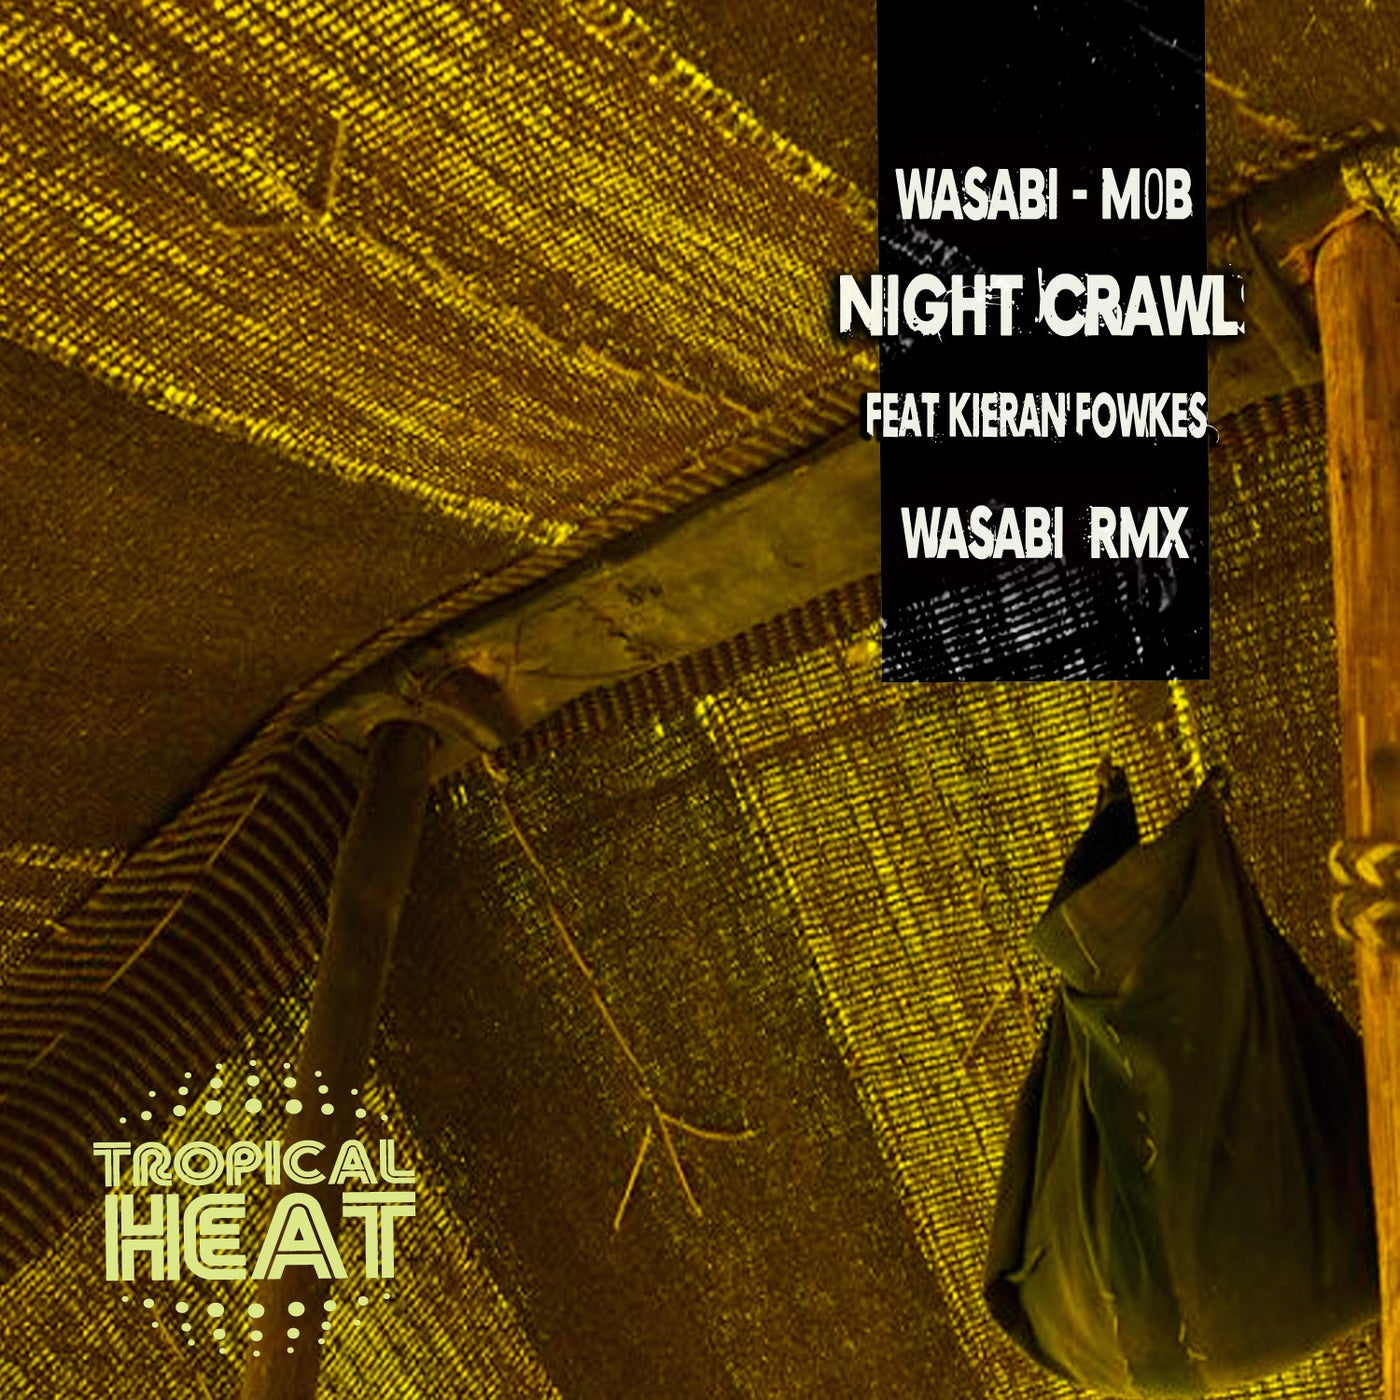 NIght Crawl feat Kieran Fowkes (Wasabi Rmx)